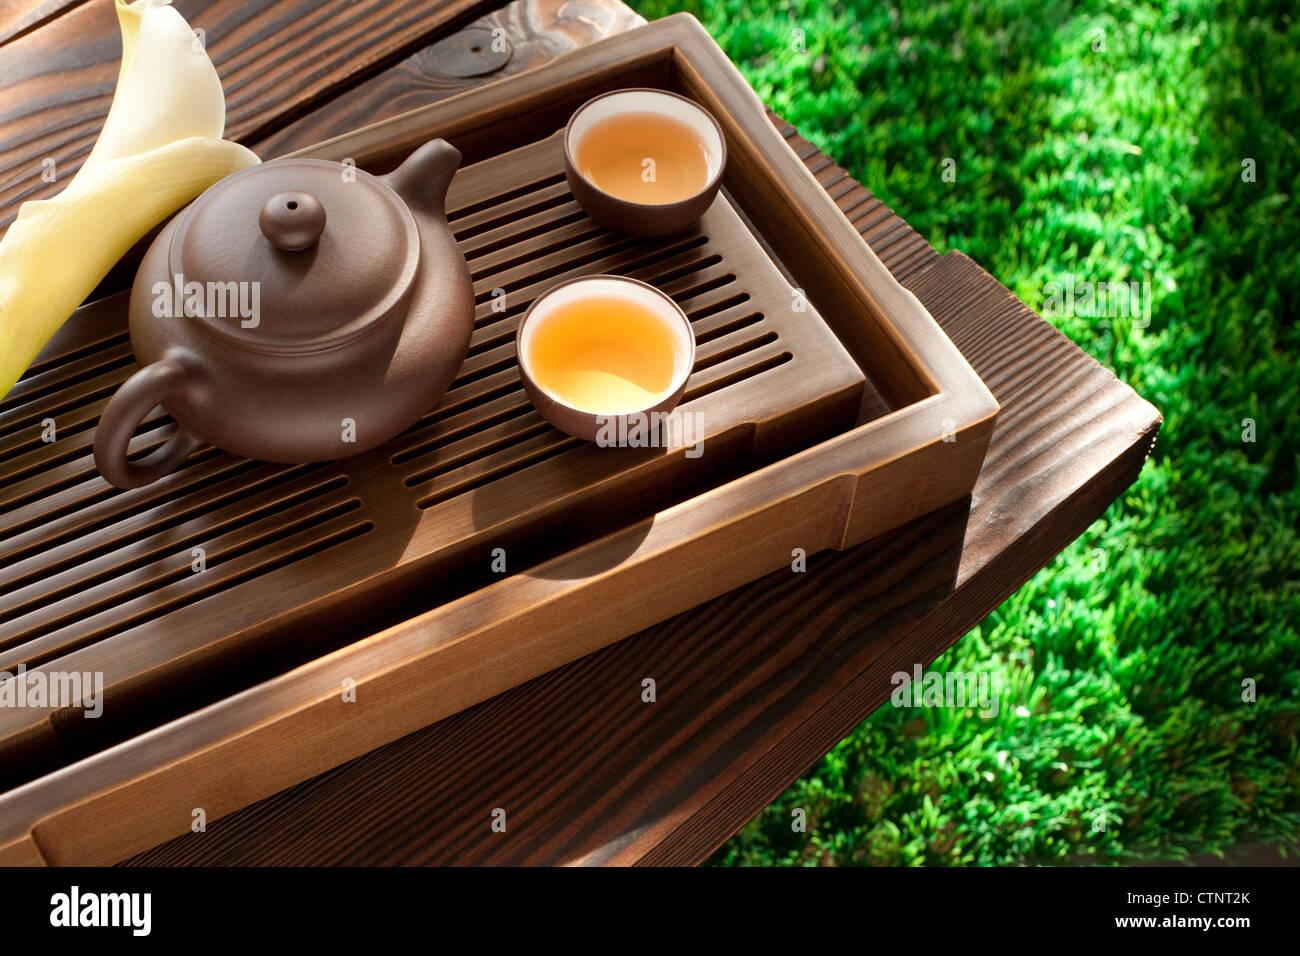 Tea and tea set - Stock Image